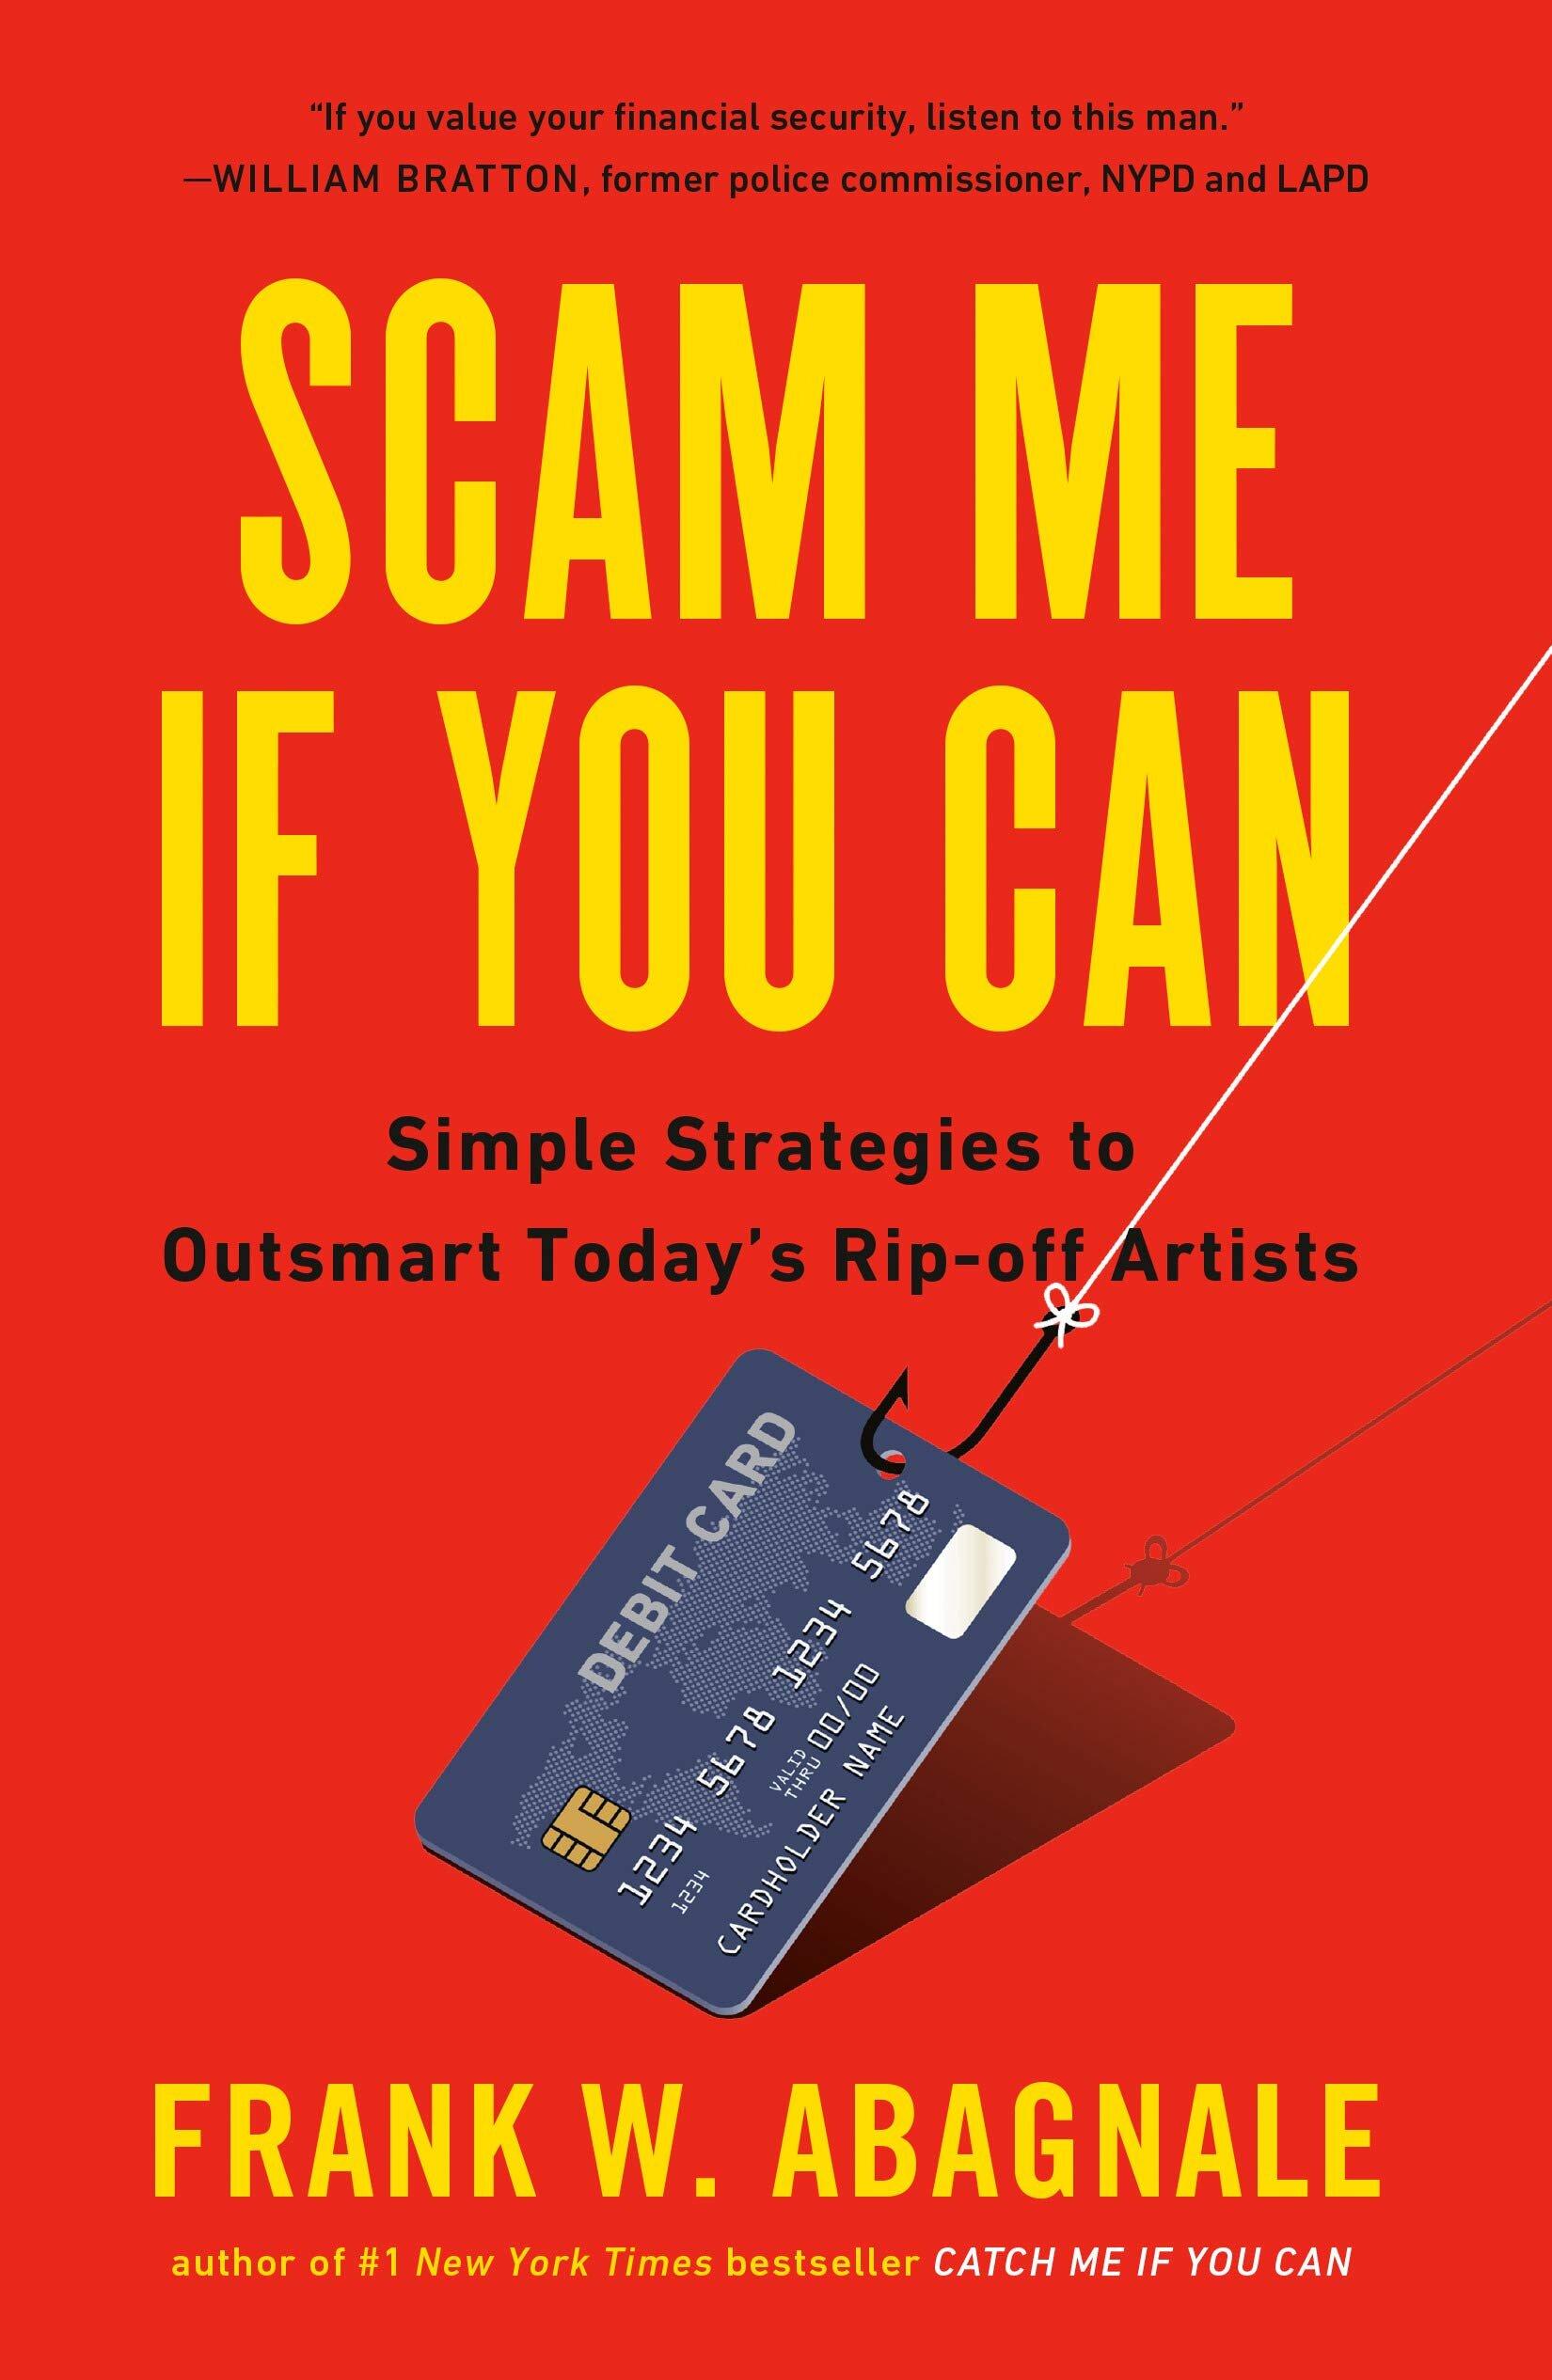 scam 1.jpg